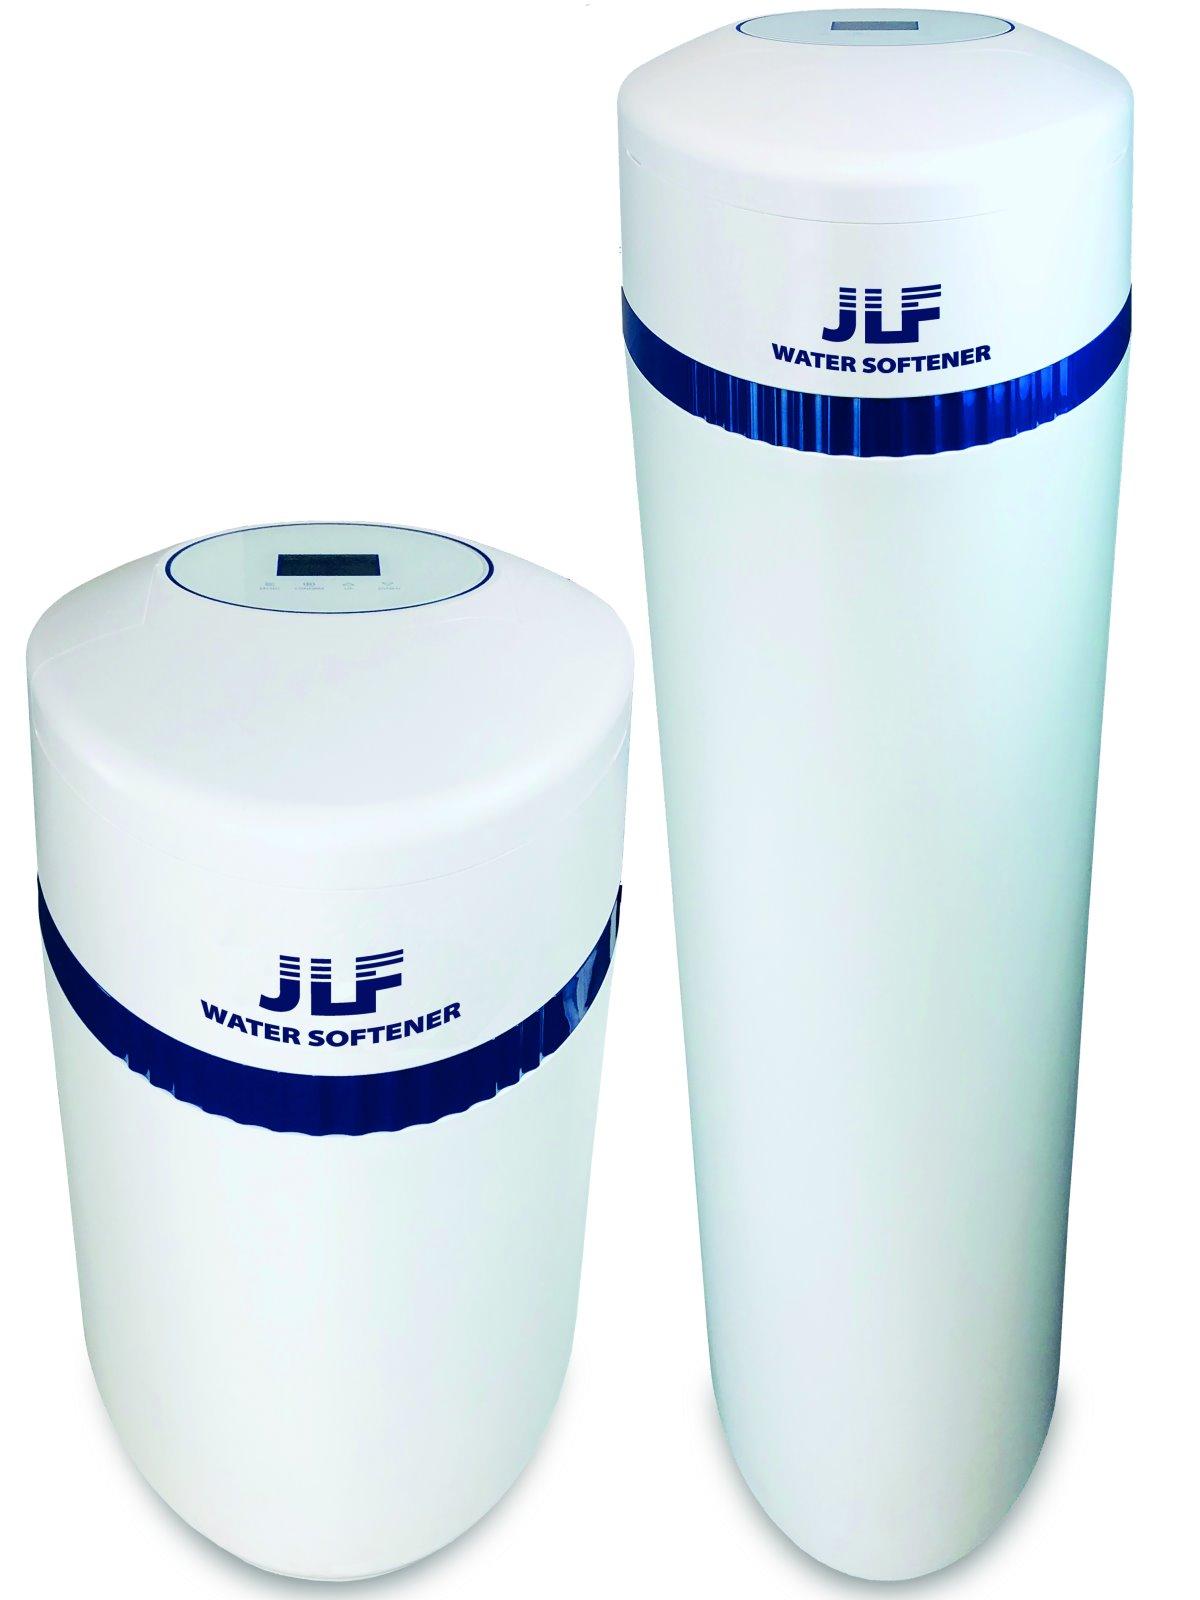 JLF Water Softener - Blødgøringsanlæg eller en H2O water softener